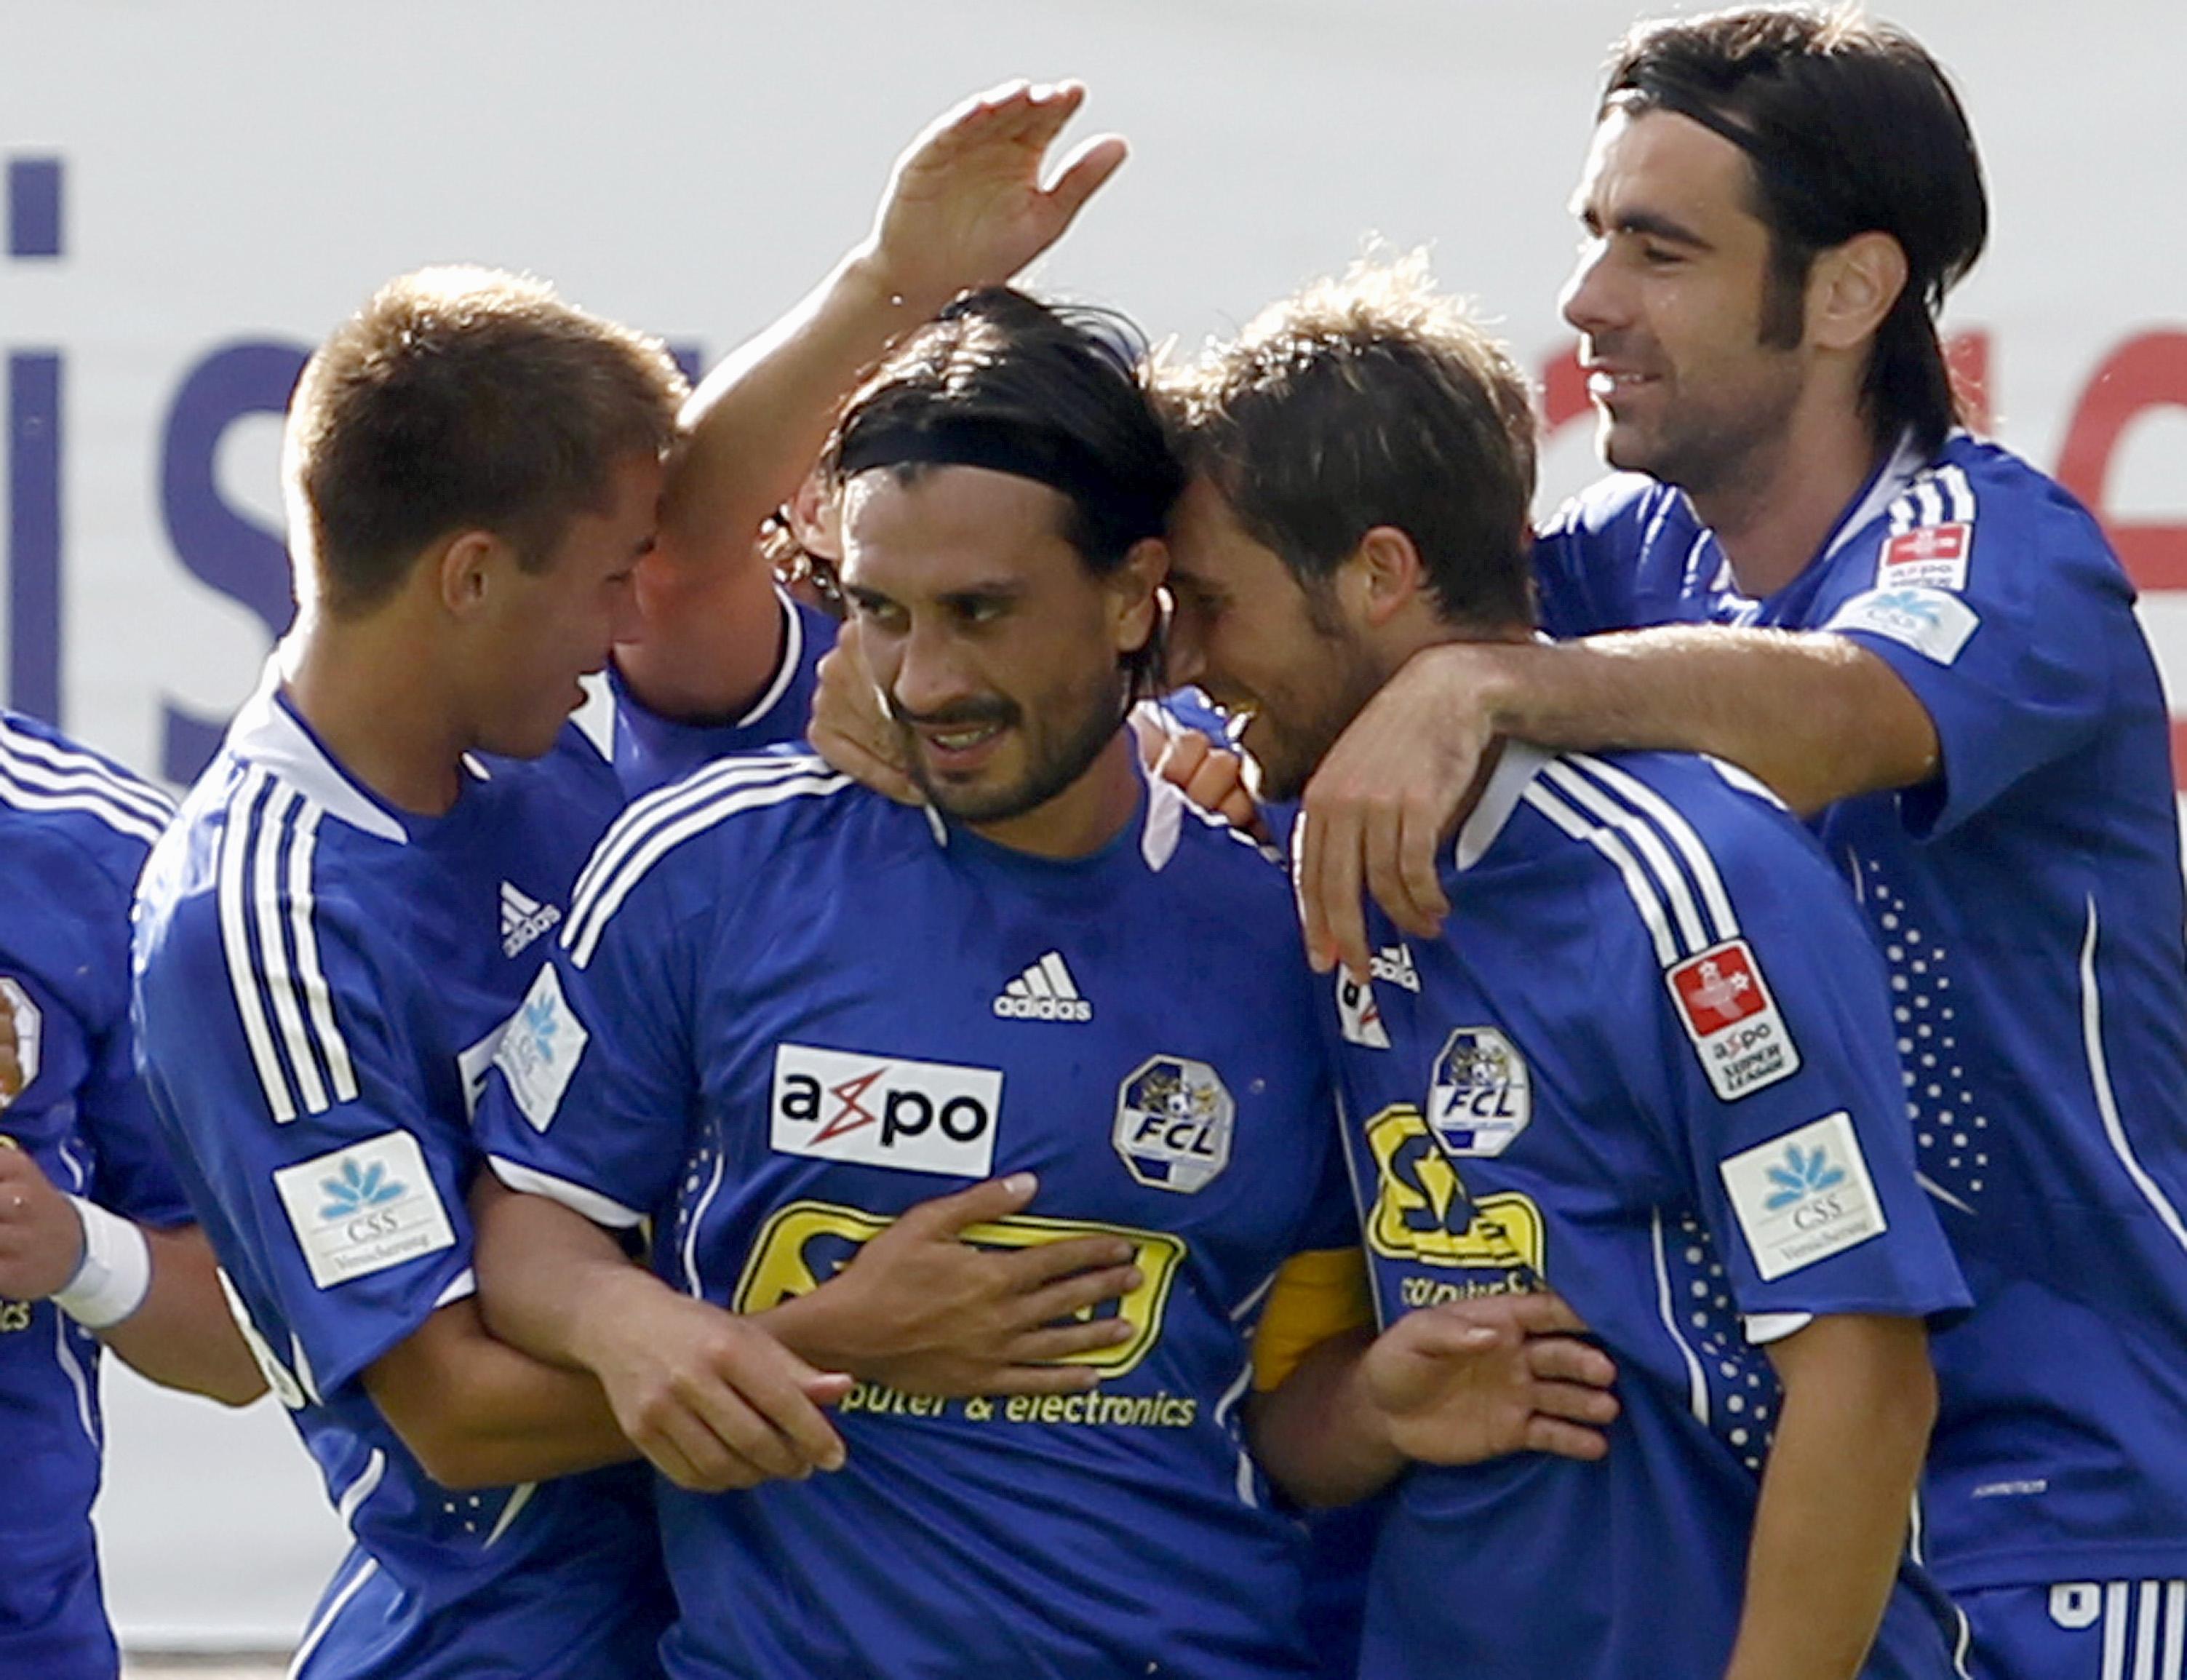 Igl FC Lucerna è actualmain sin il segund plaz da la Super League.